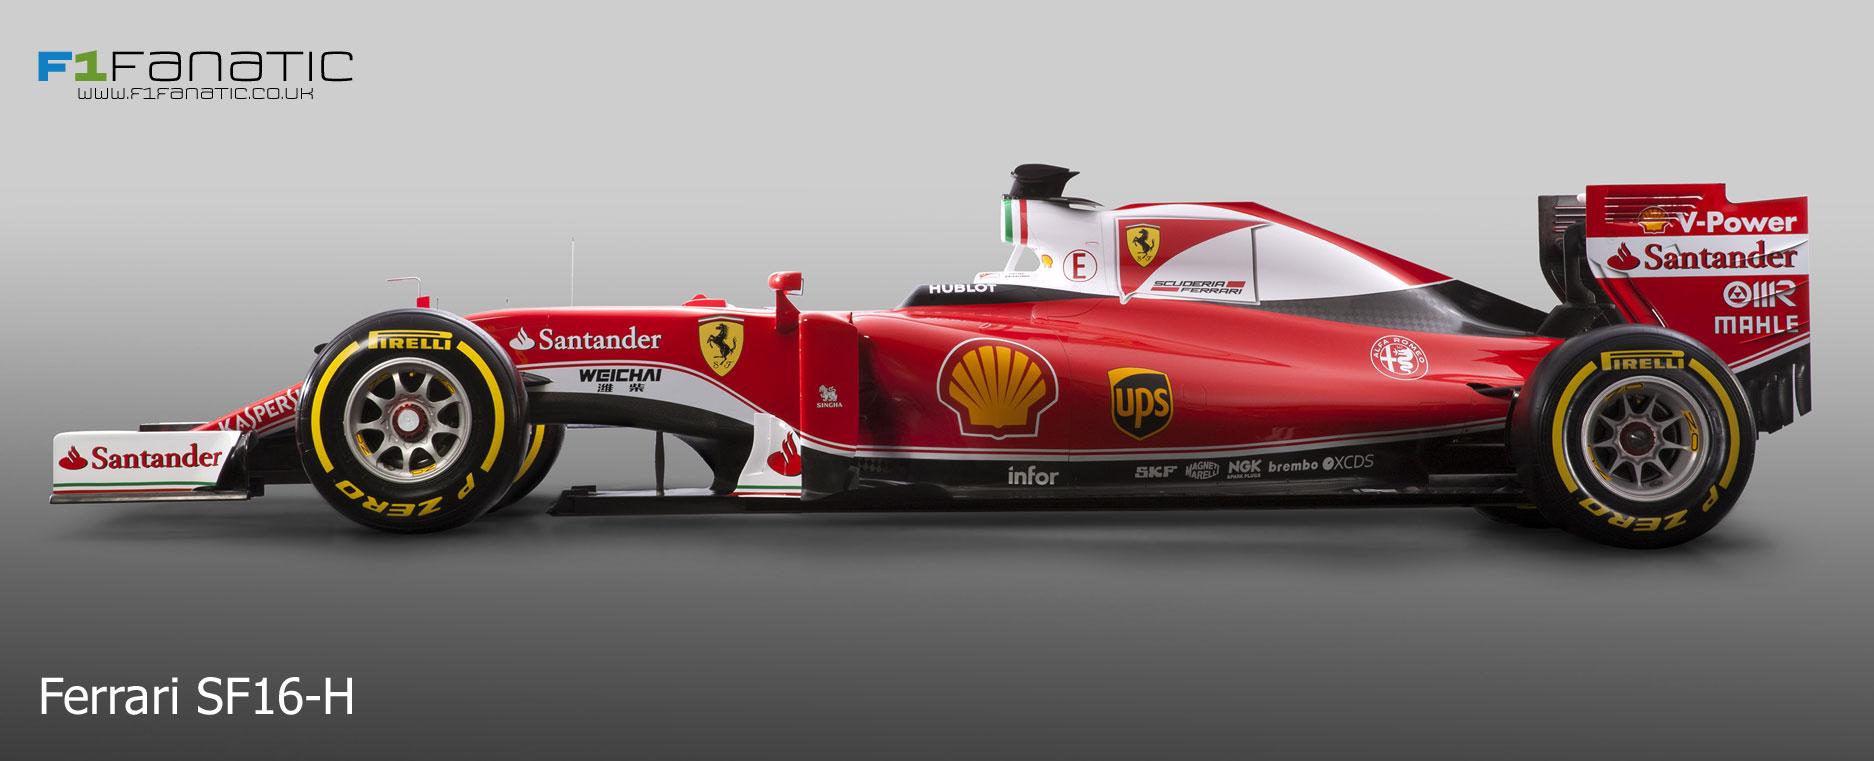 Compare Ferrari's new SF16-H with their 2015 car · RaceFans